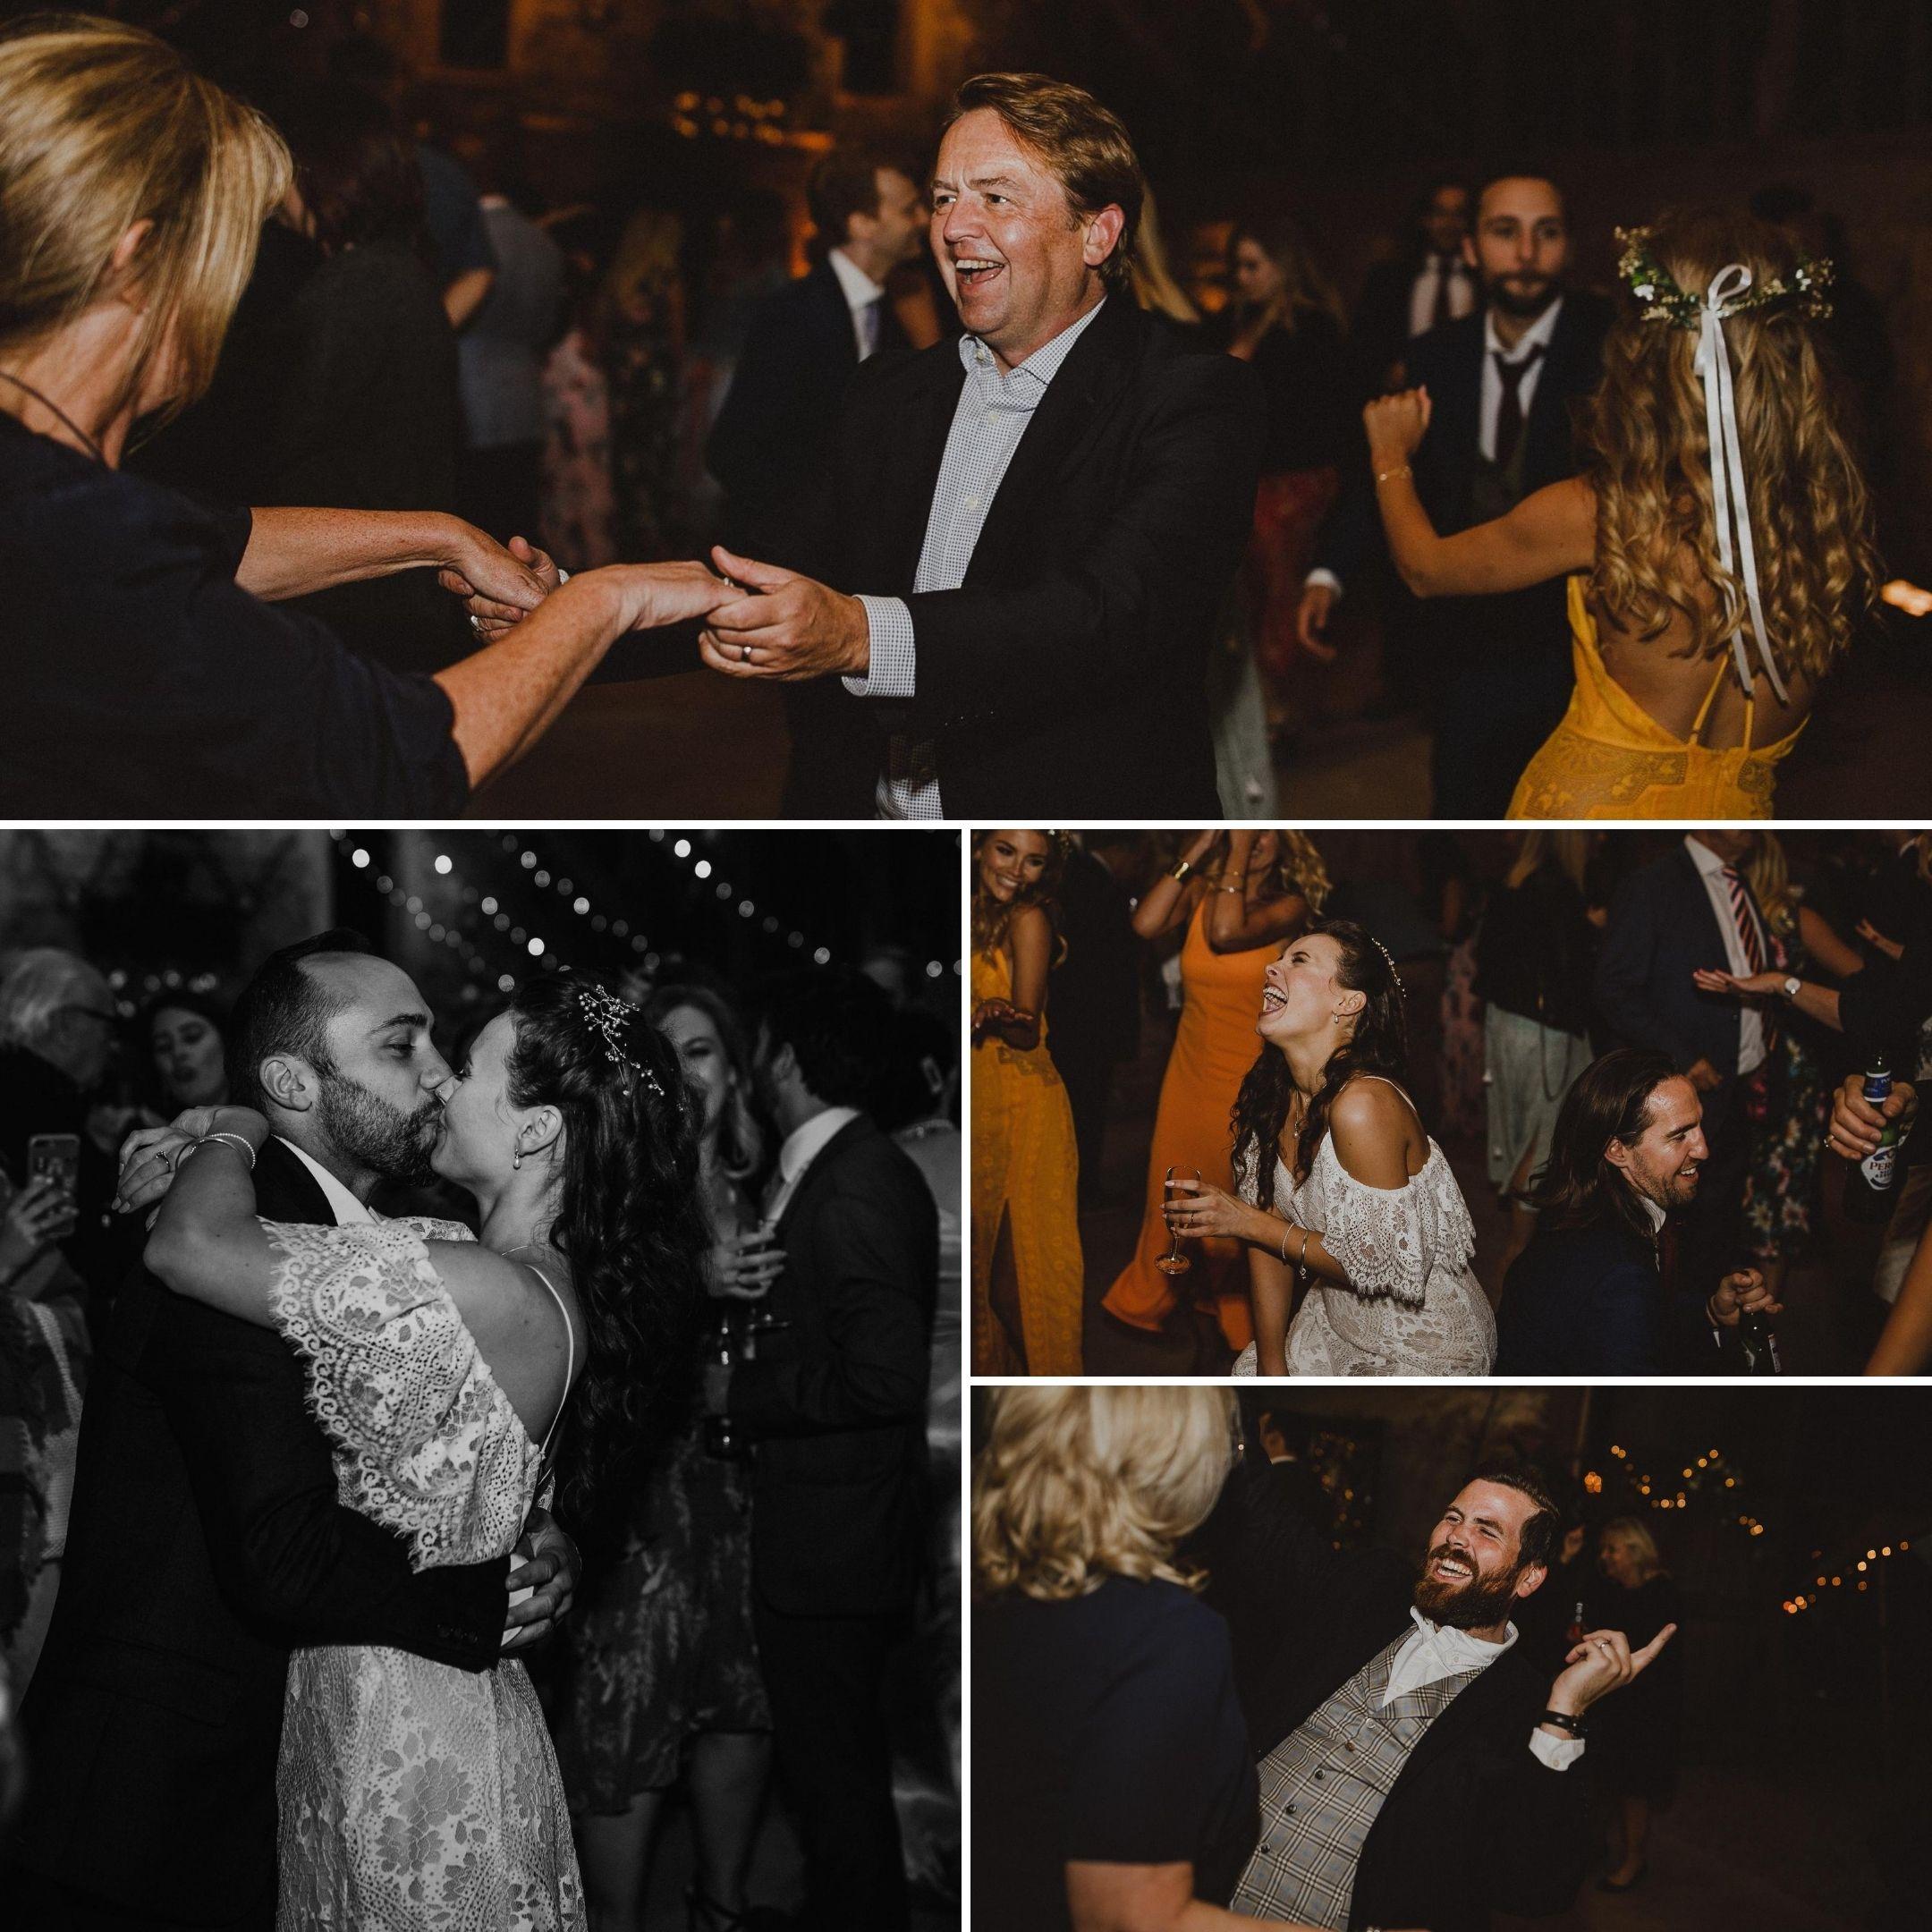 Wedding Dancing Tasha and Tom